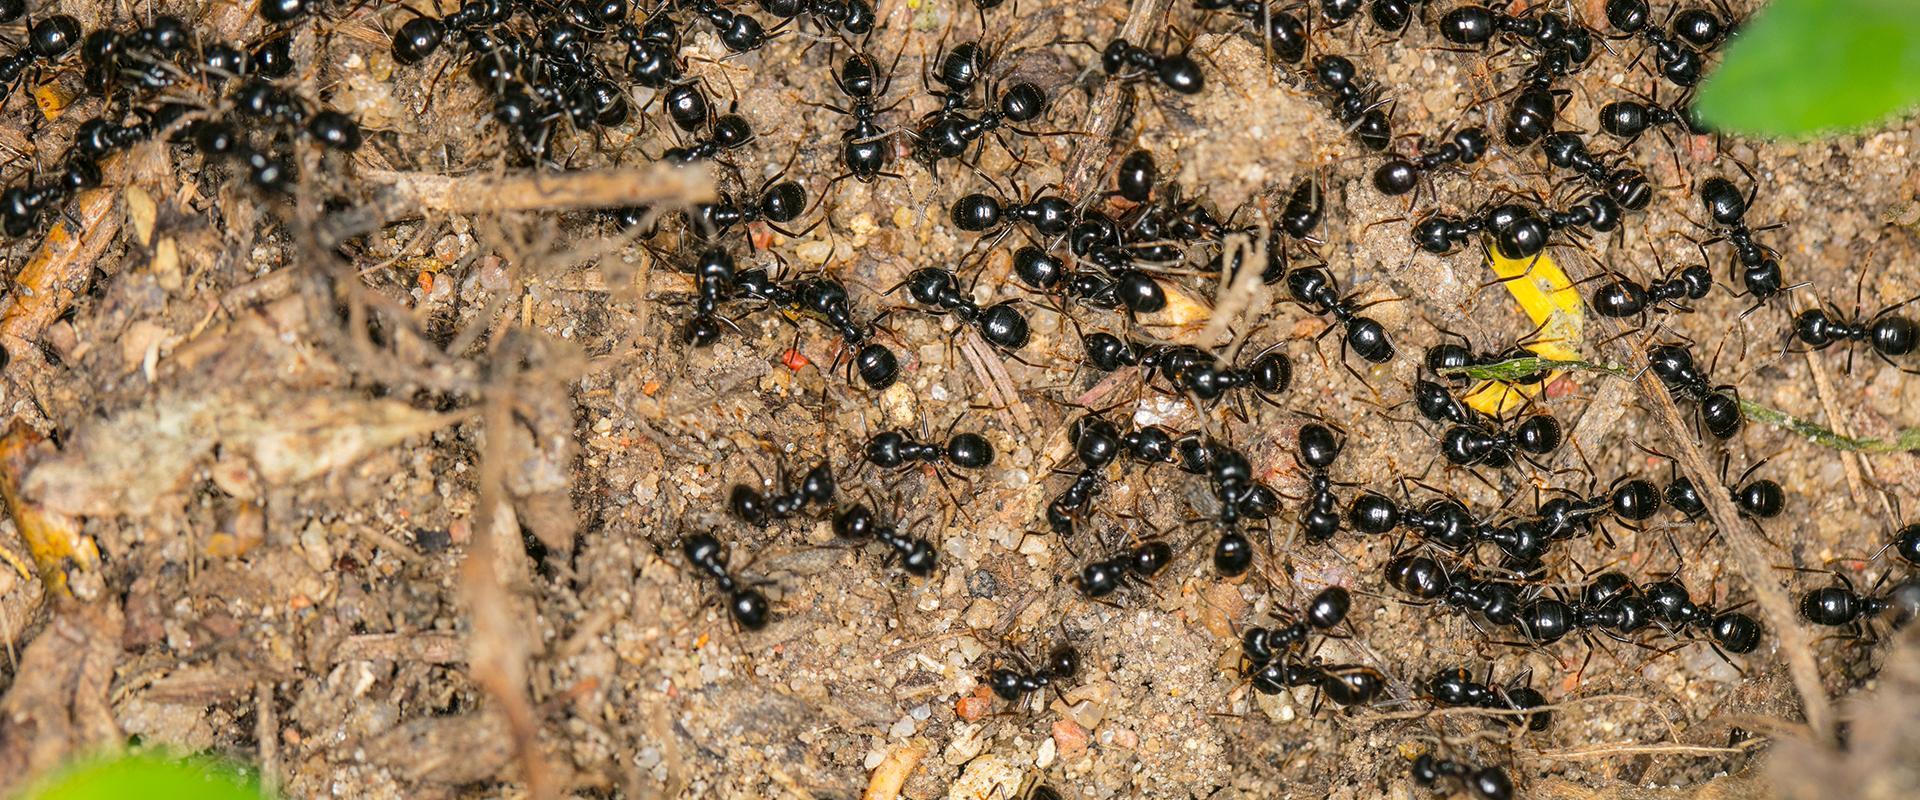 termites eating wood in crestview florida